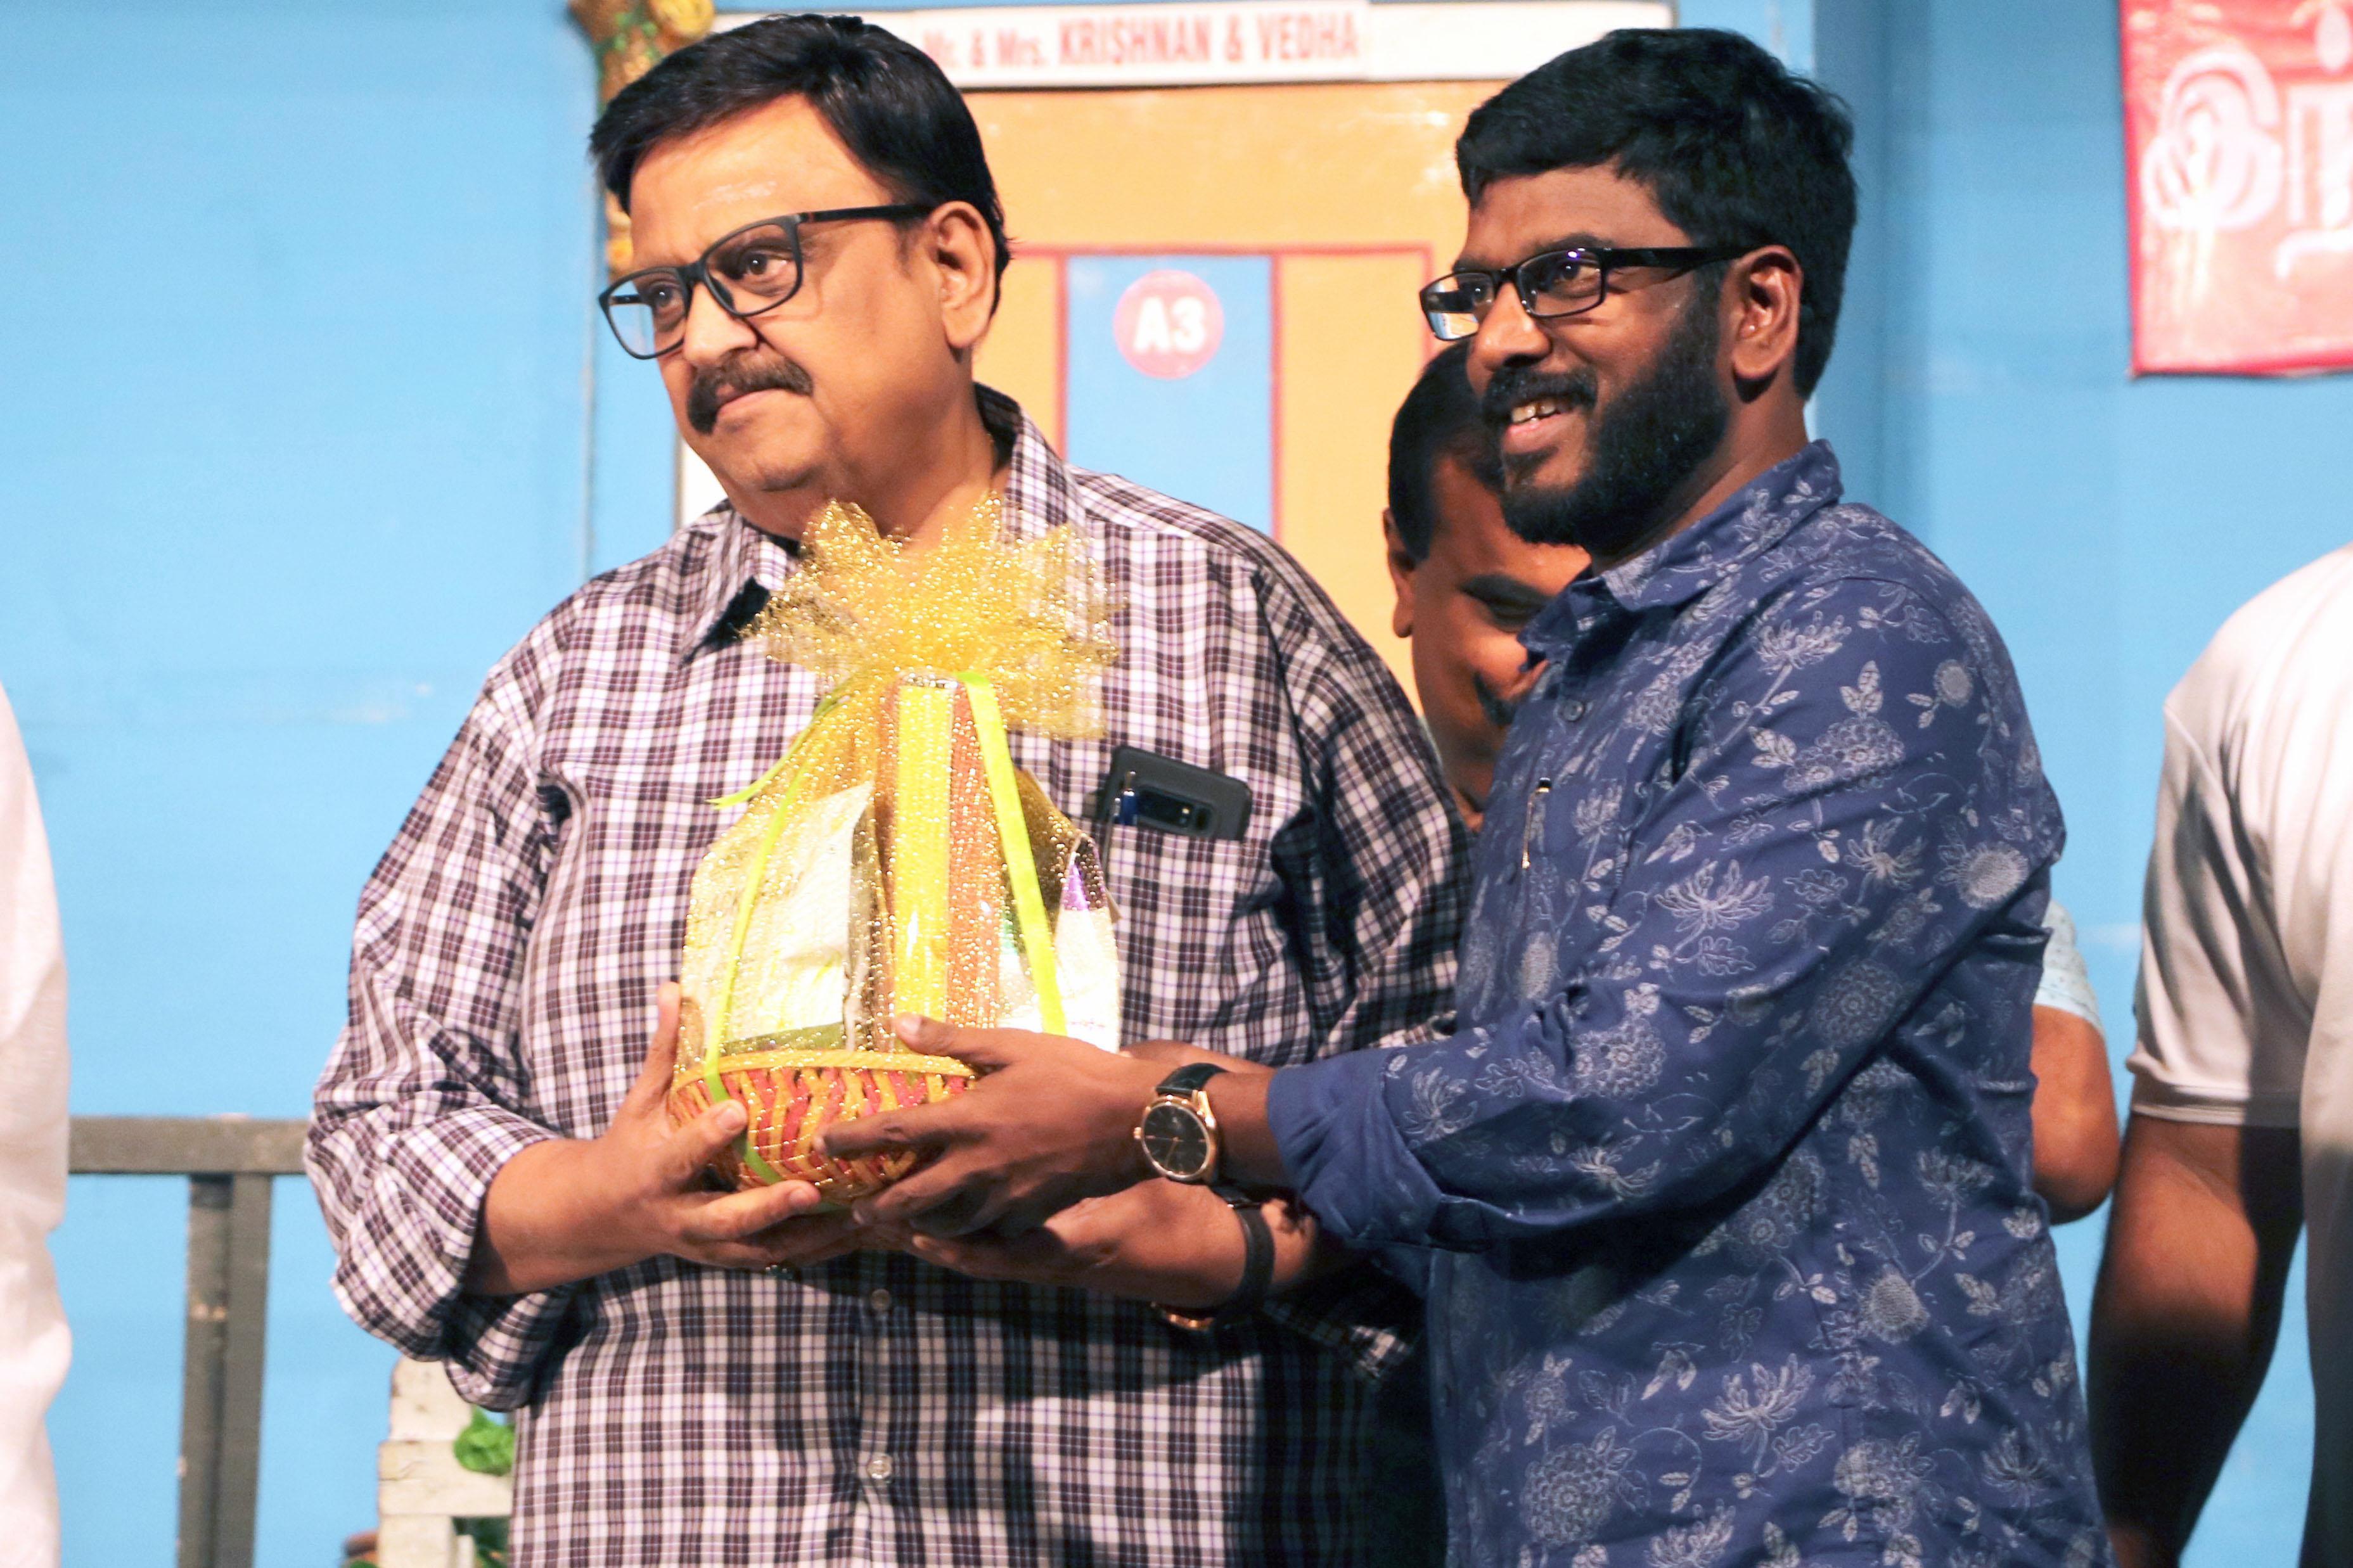 Mr.KATHIRAVAN with Singer S. P. BALASUBRAHMANYAM